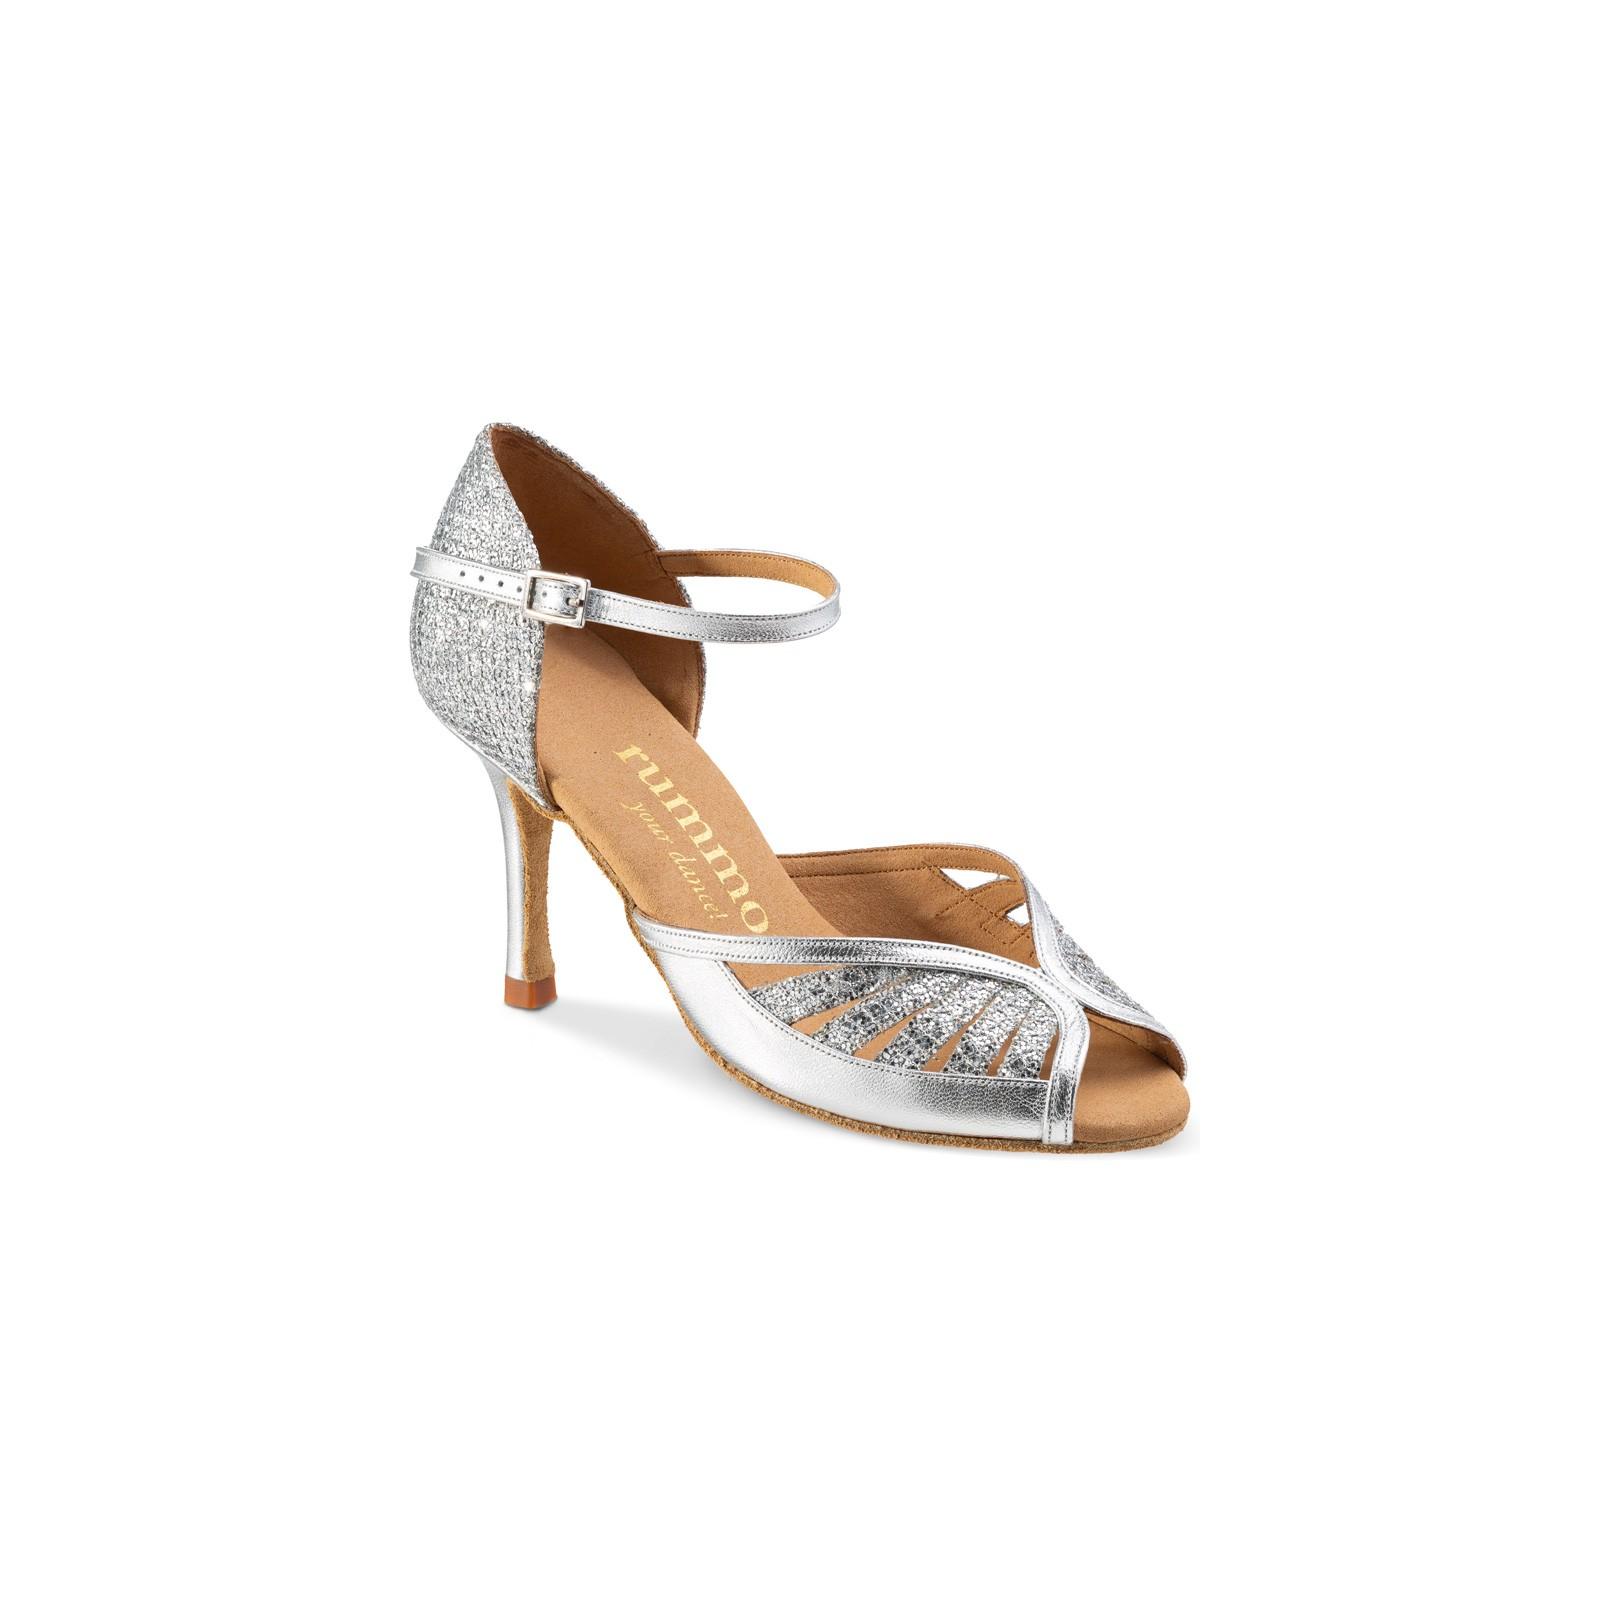 Chic Belle Noire Promo Chaussures Femmes 2018 Glitter